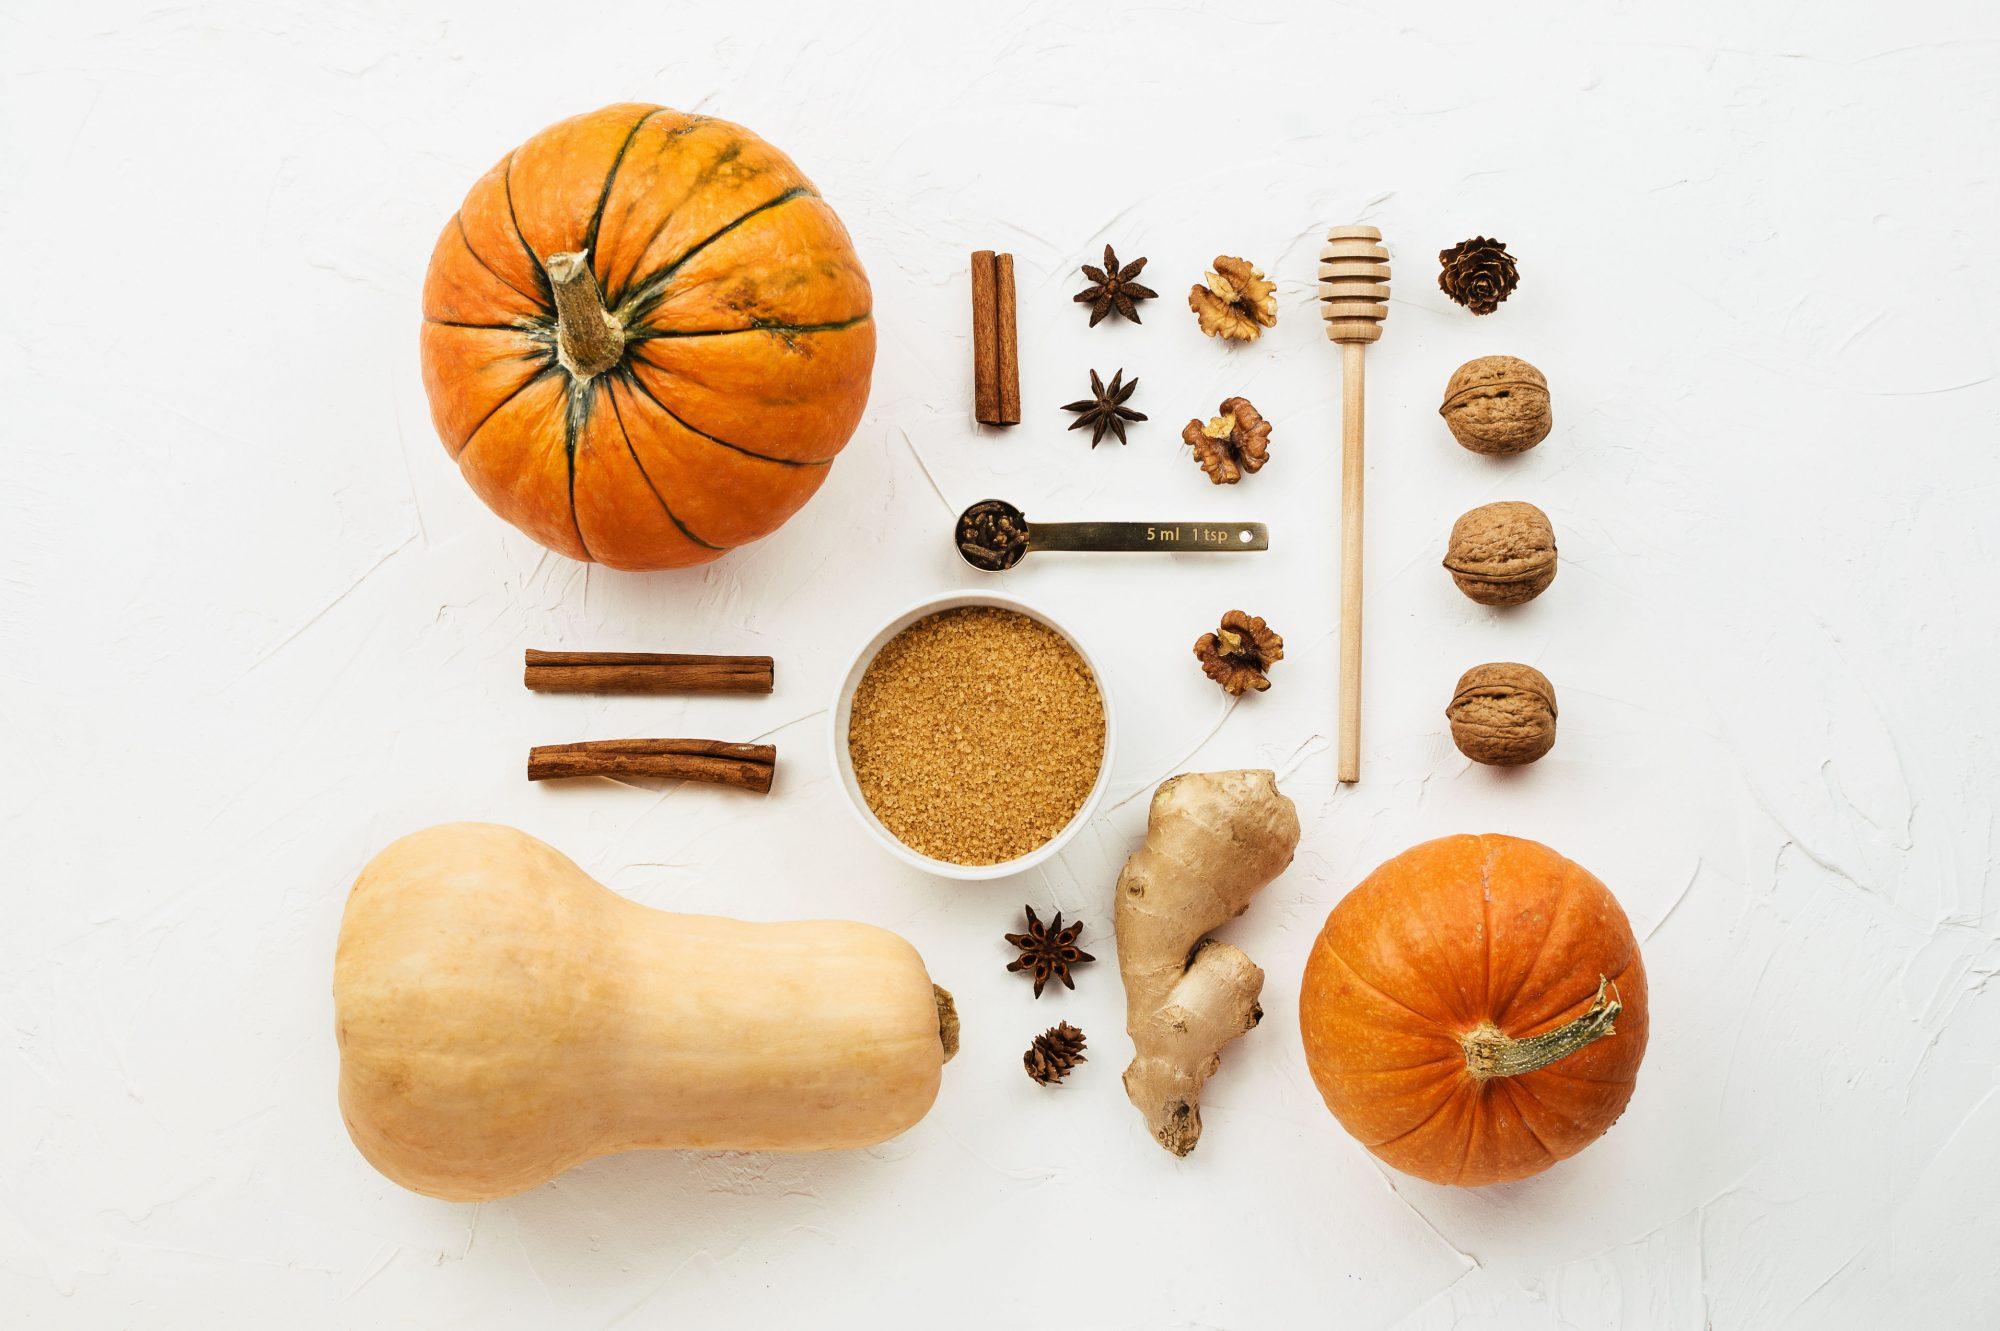 Pumpkin Spice Components